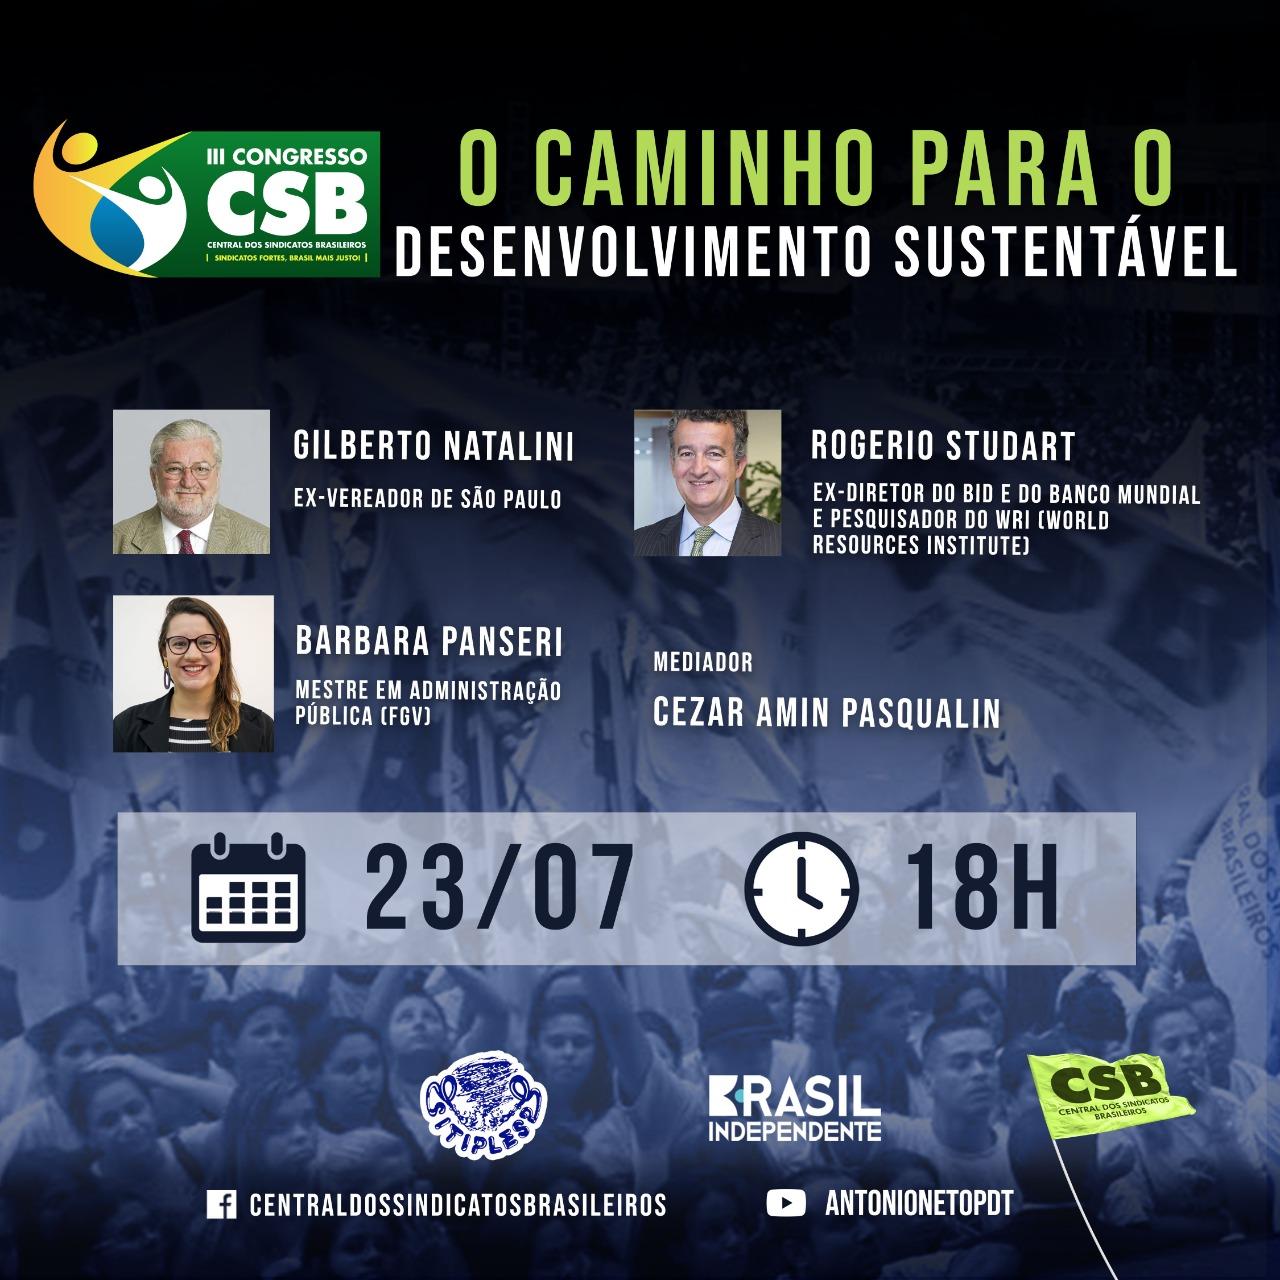 Desenvolvimento Sustentável com Rogerio Studart, Gilberto Natalini e Barbara Panseri